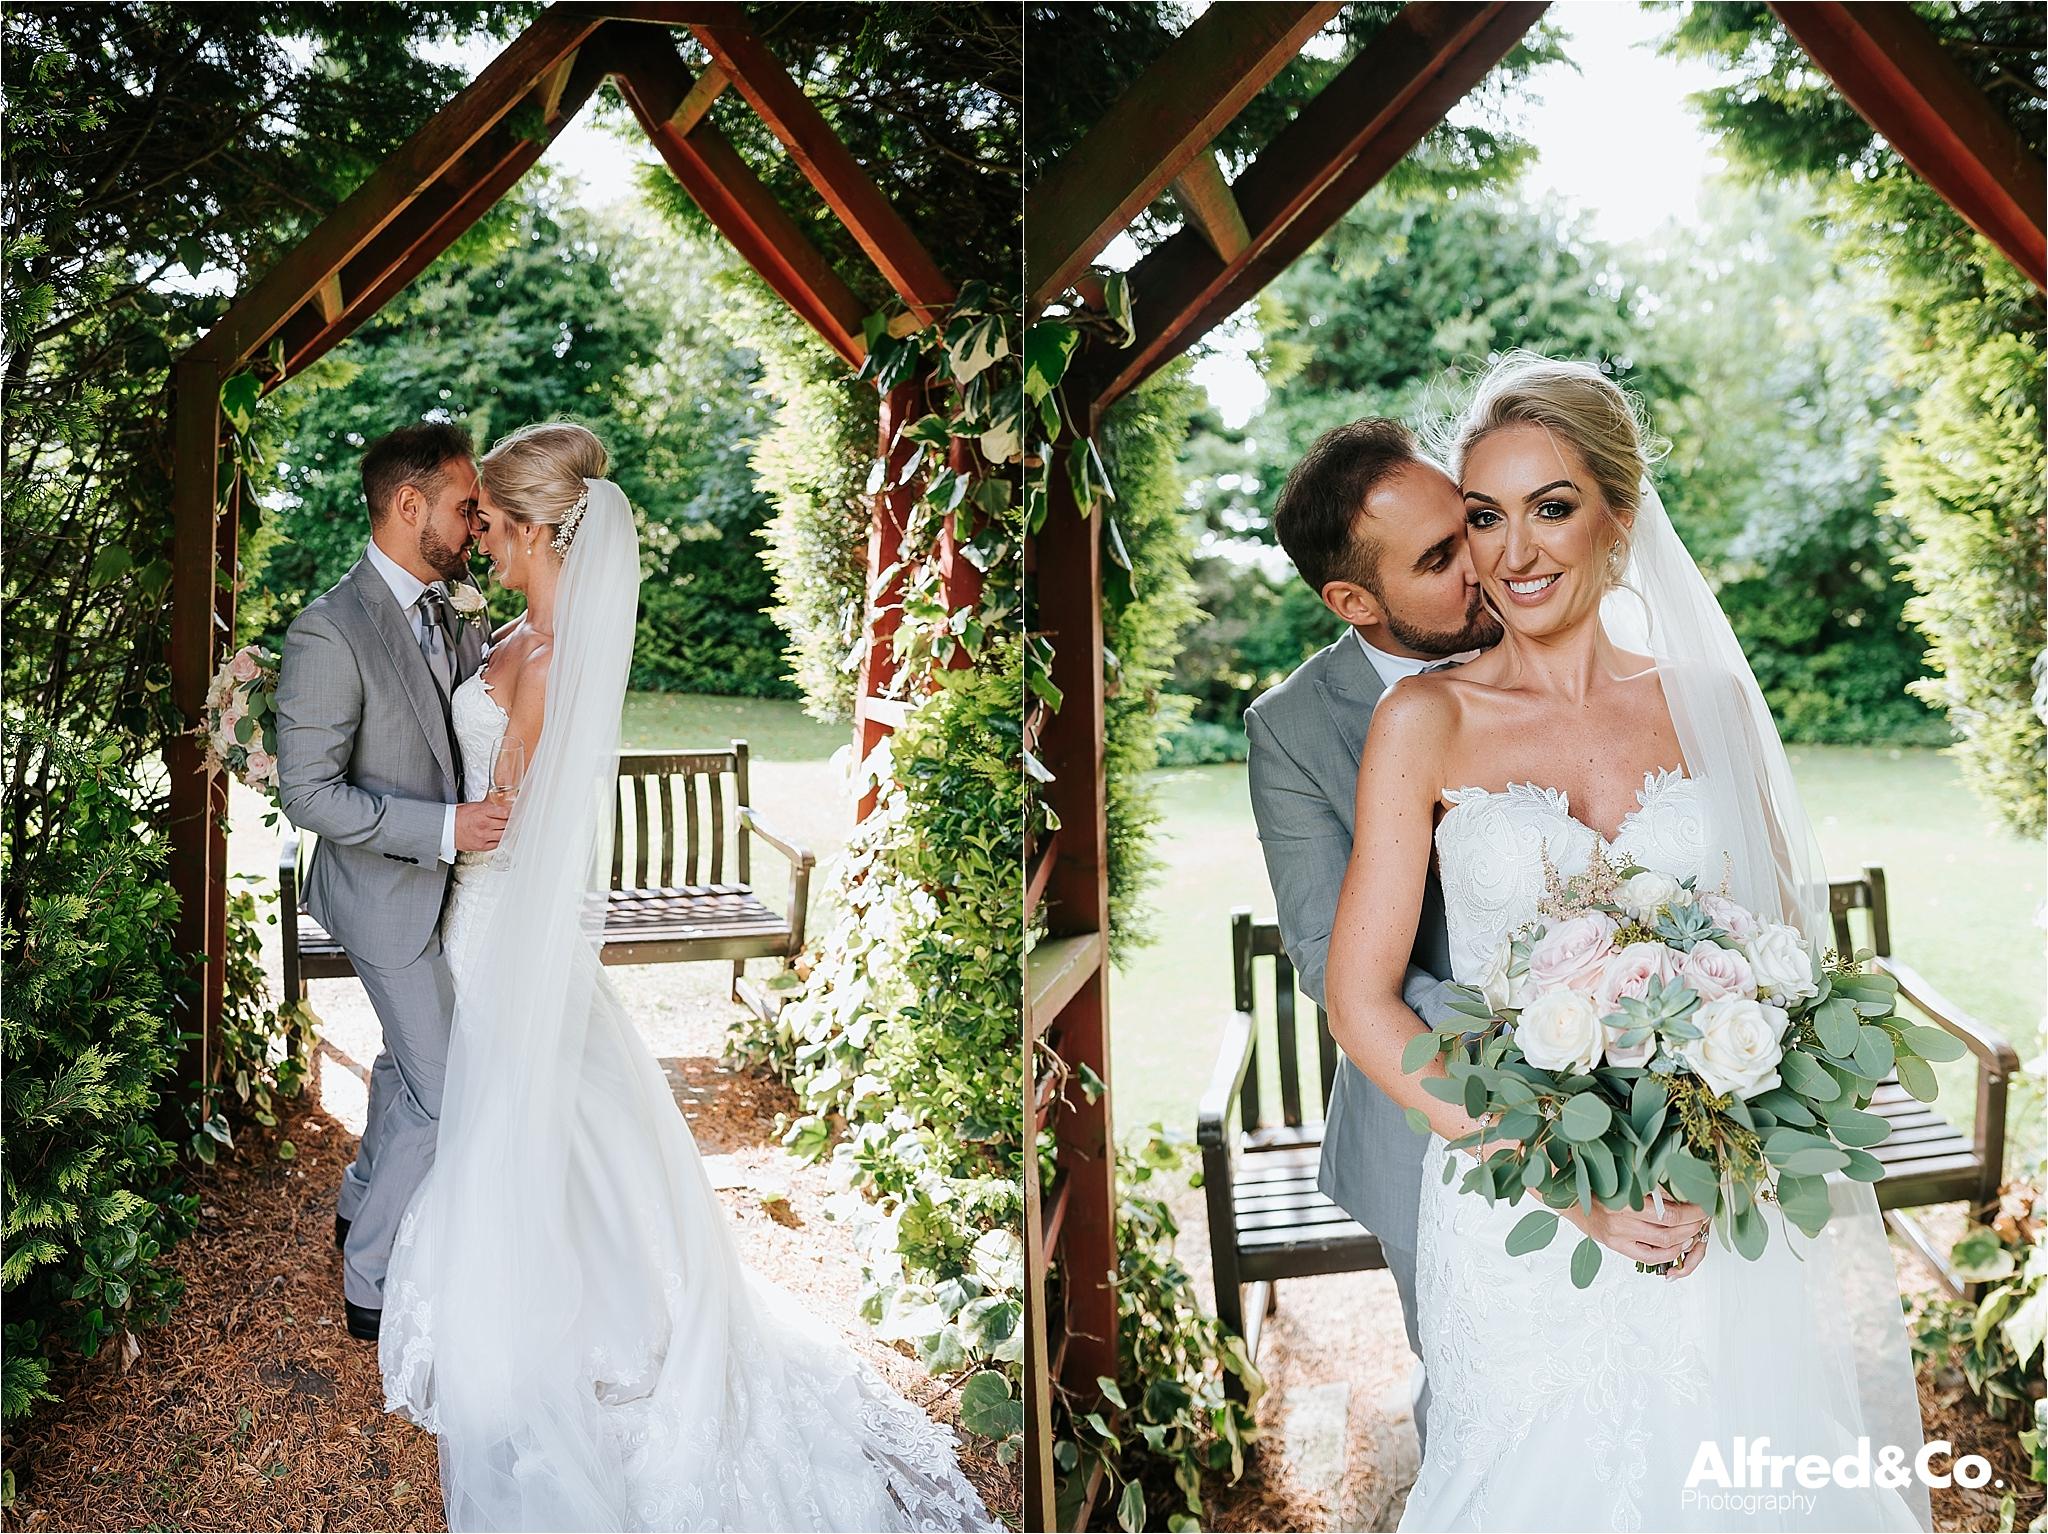 Wedding Photographer in Accrington Lancashire